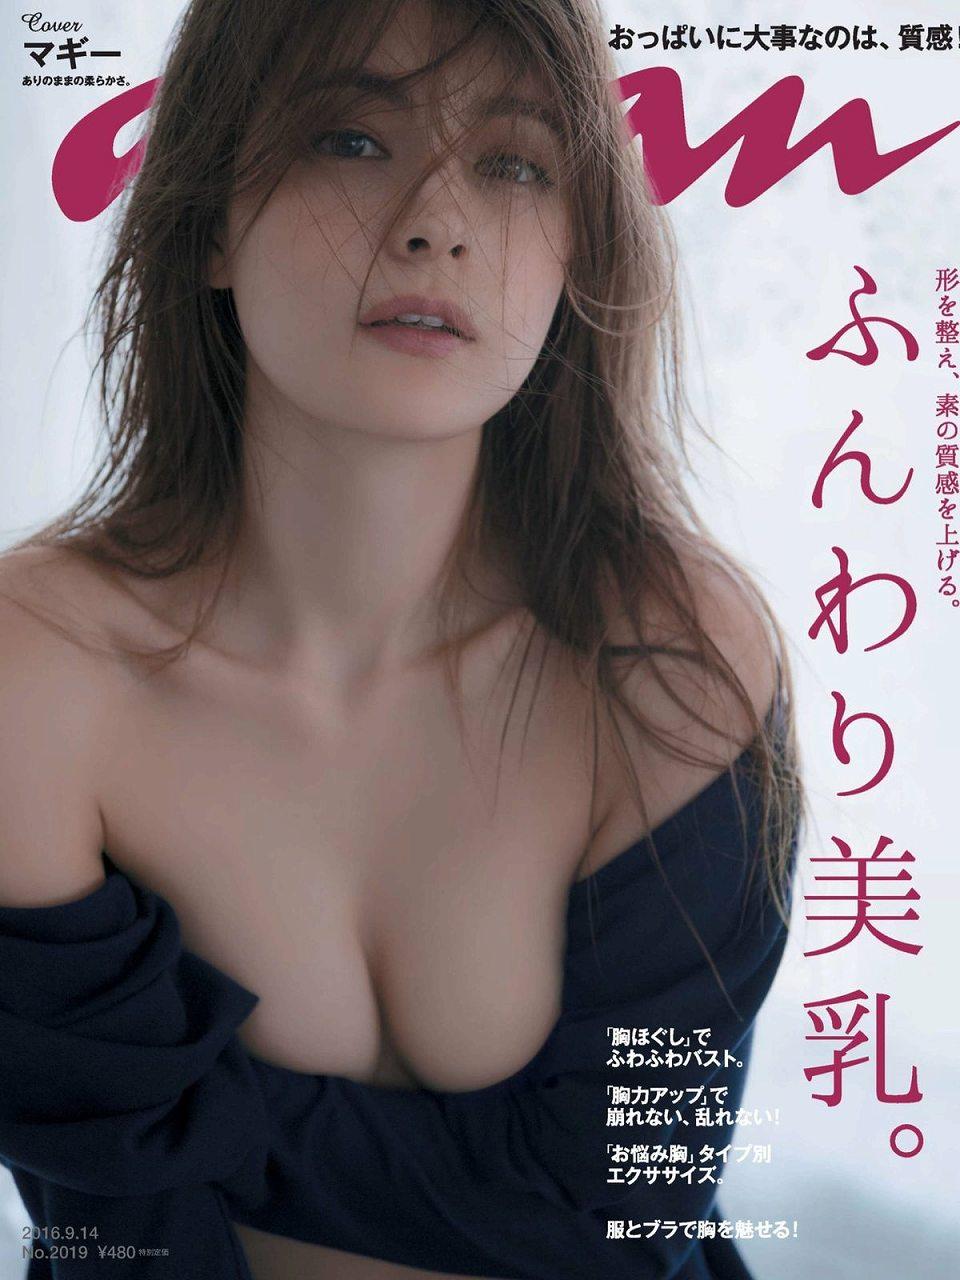 「anan (アンアン) 2016年 9月14日号 No.2019」表紙のマギー